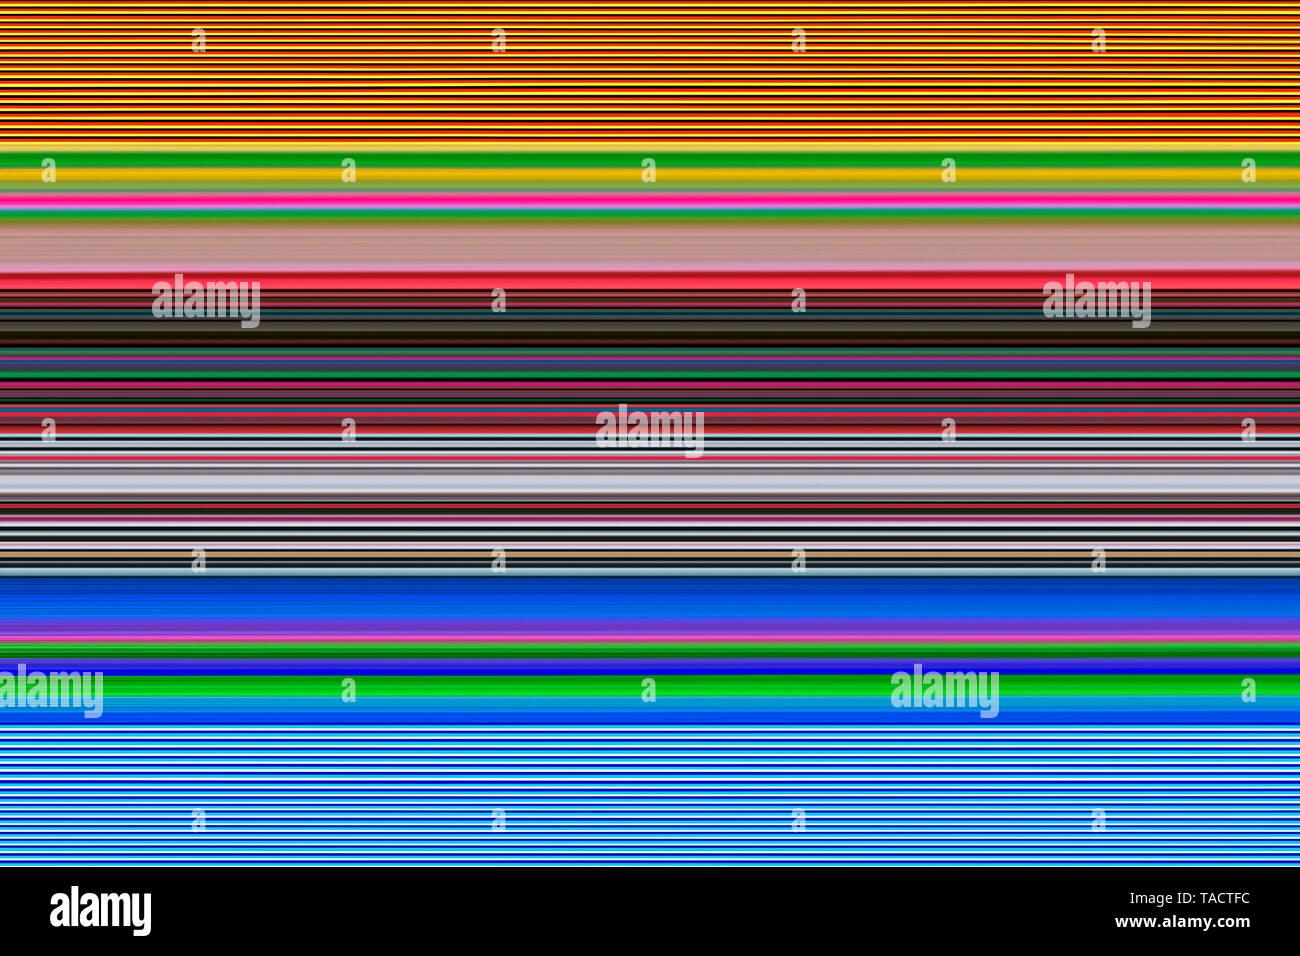 Modern fine art computer digital paintings creative hypnotist imagination colourful line vhm 3/4/2015. - Stock Image